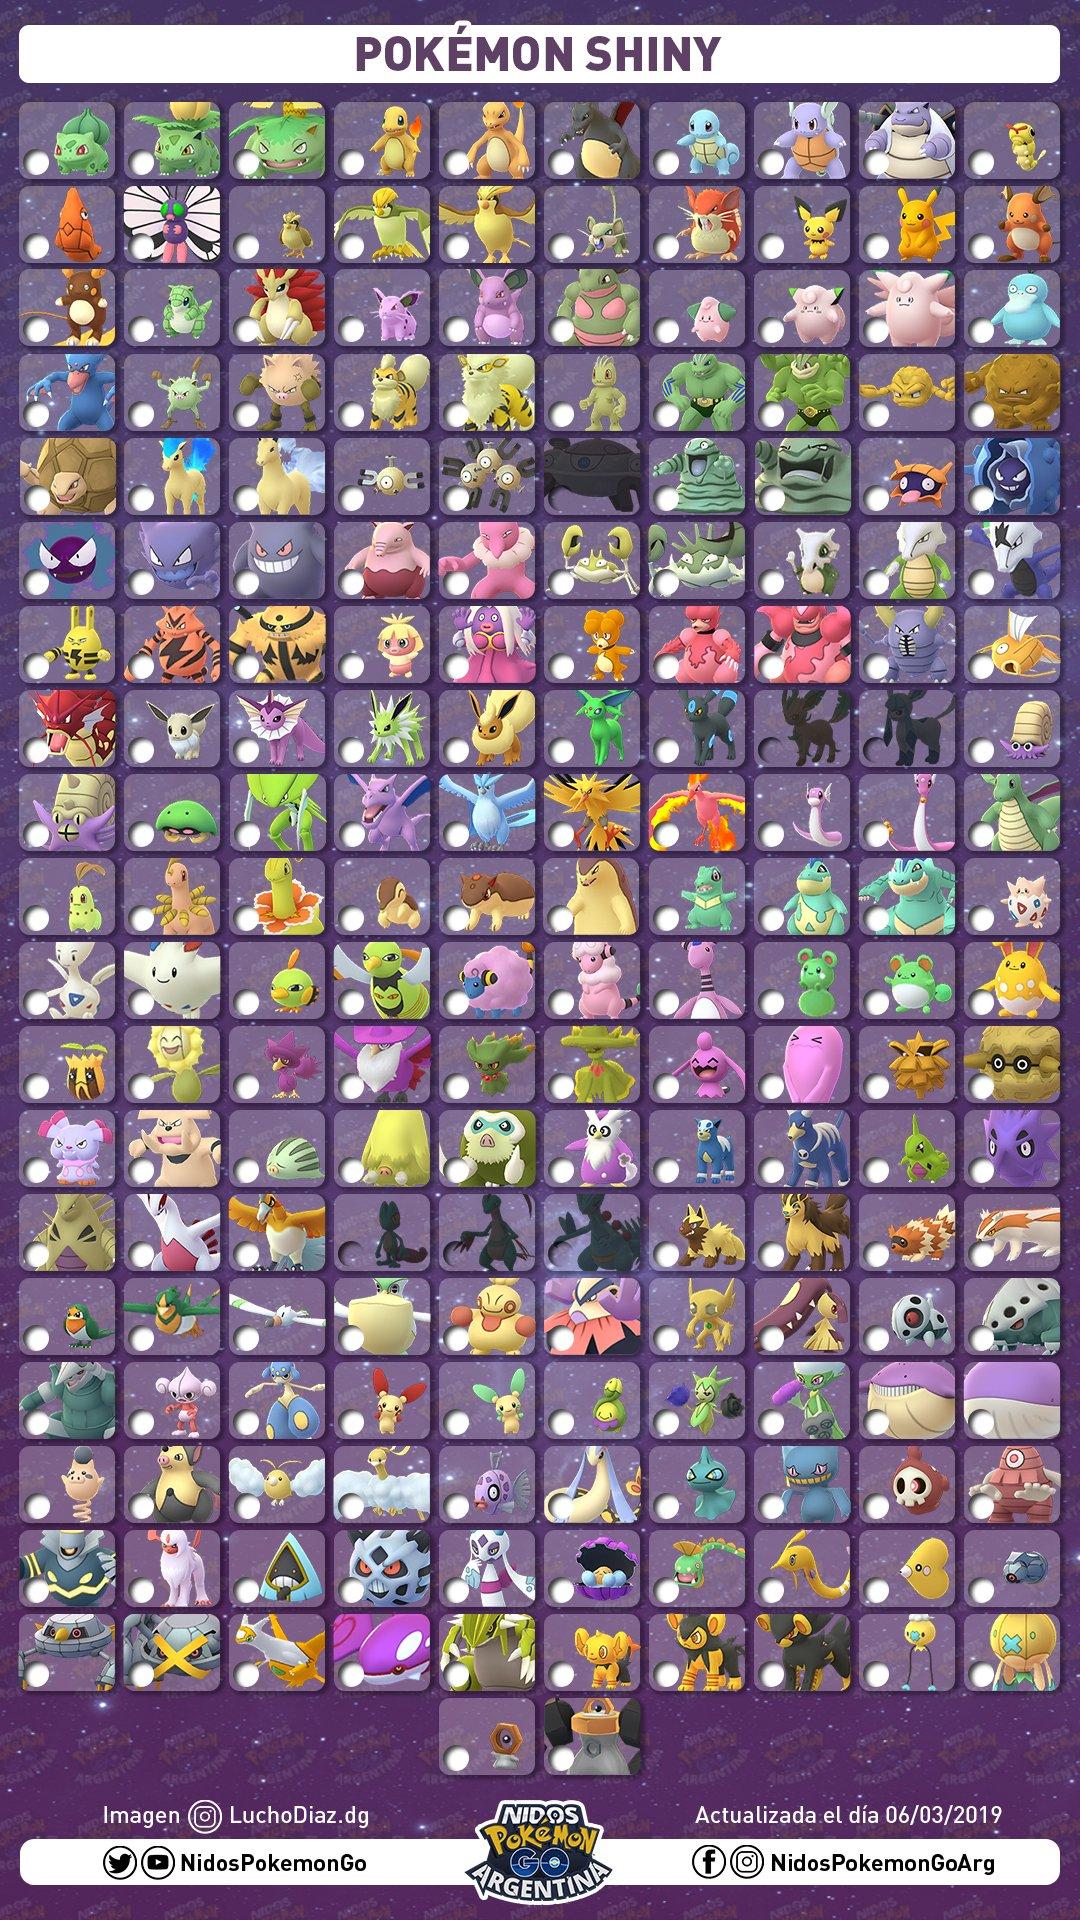 Lista de Pokémon shiny Marzo 2019 hecha por Nidos Pokémon GO Argentina